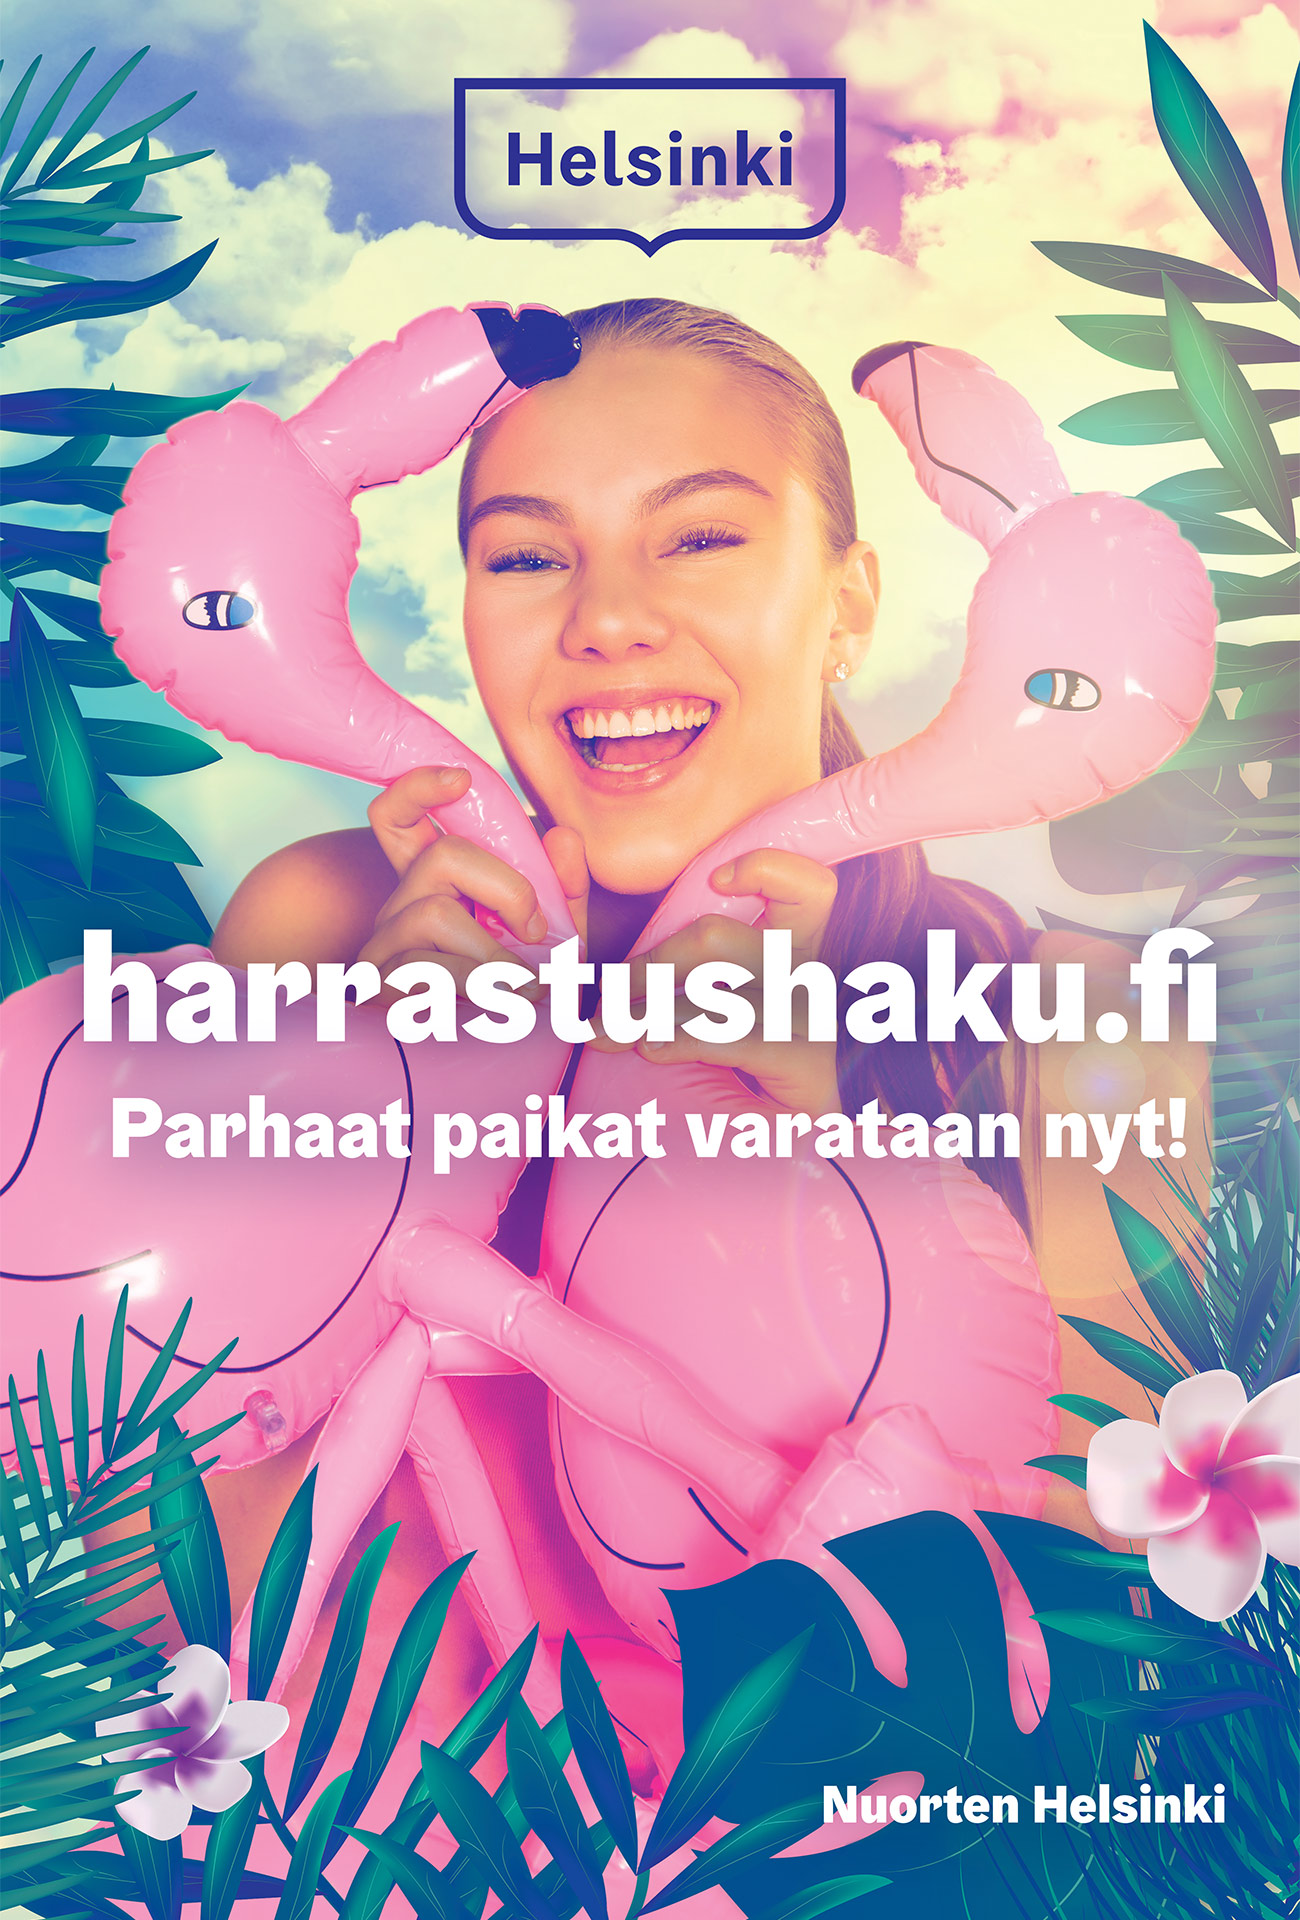 Kevatkamppis18_nuoret_Helsinki_CCadshel_kevat2018_FI_final_juliste1_1920px